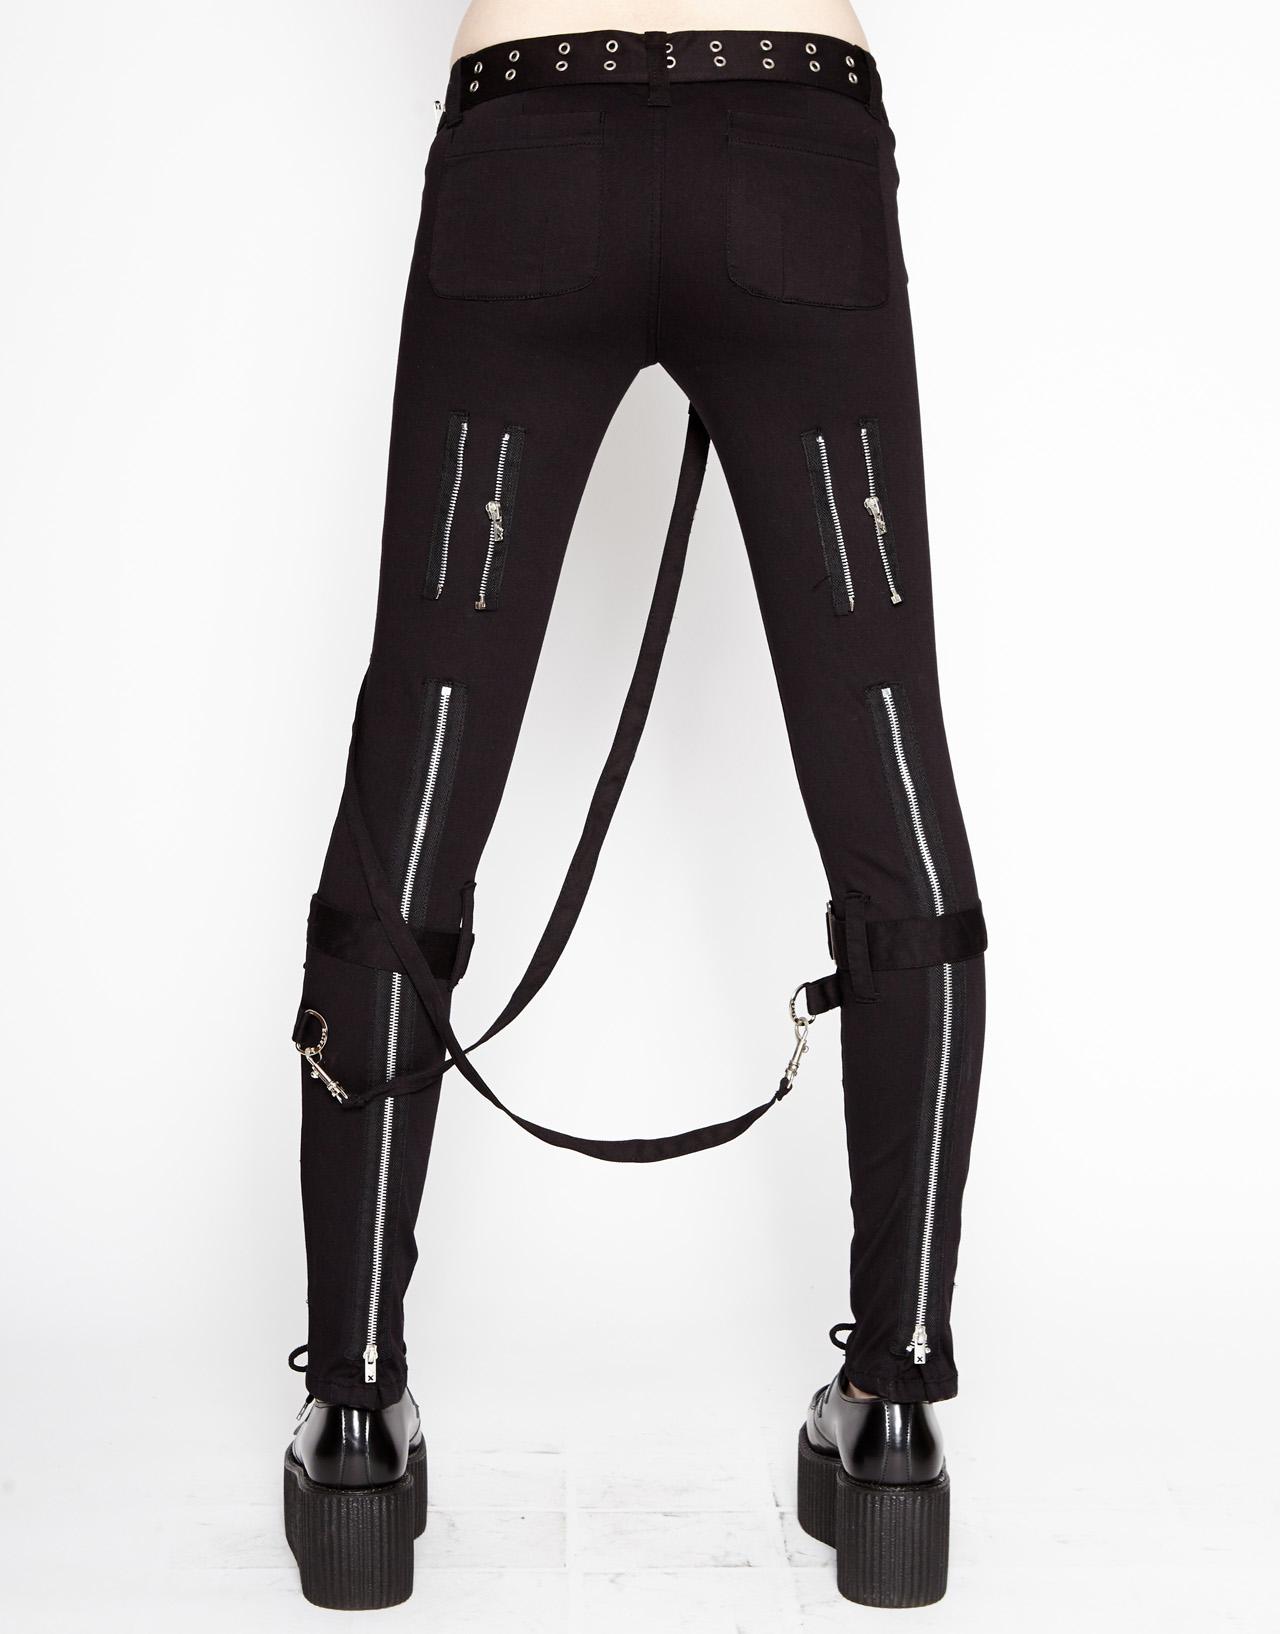 Bondage goth nyc pants tripp wholesale — photo 11